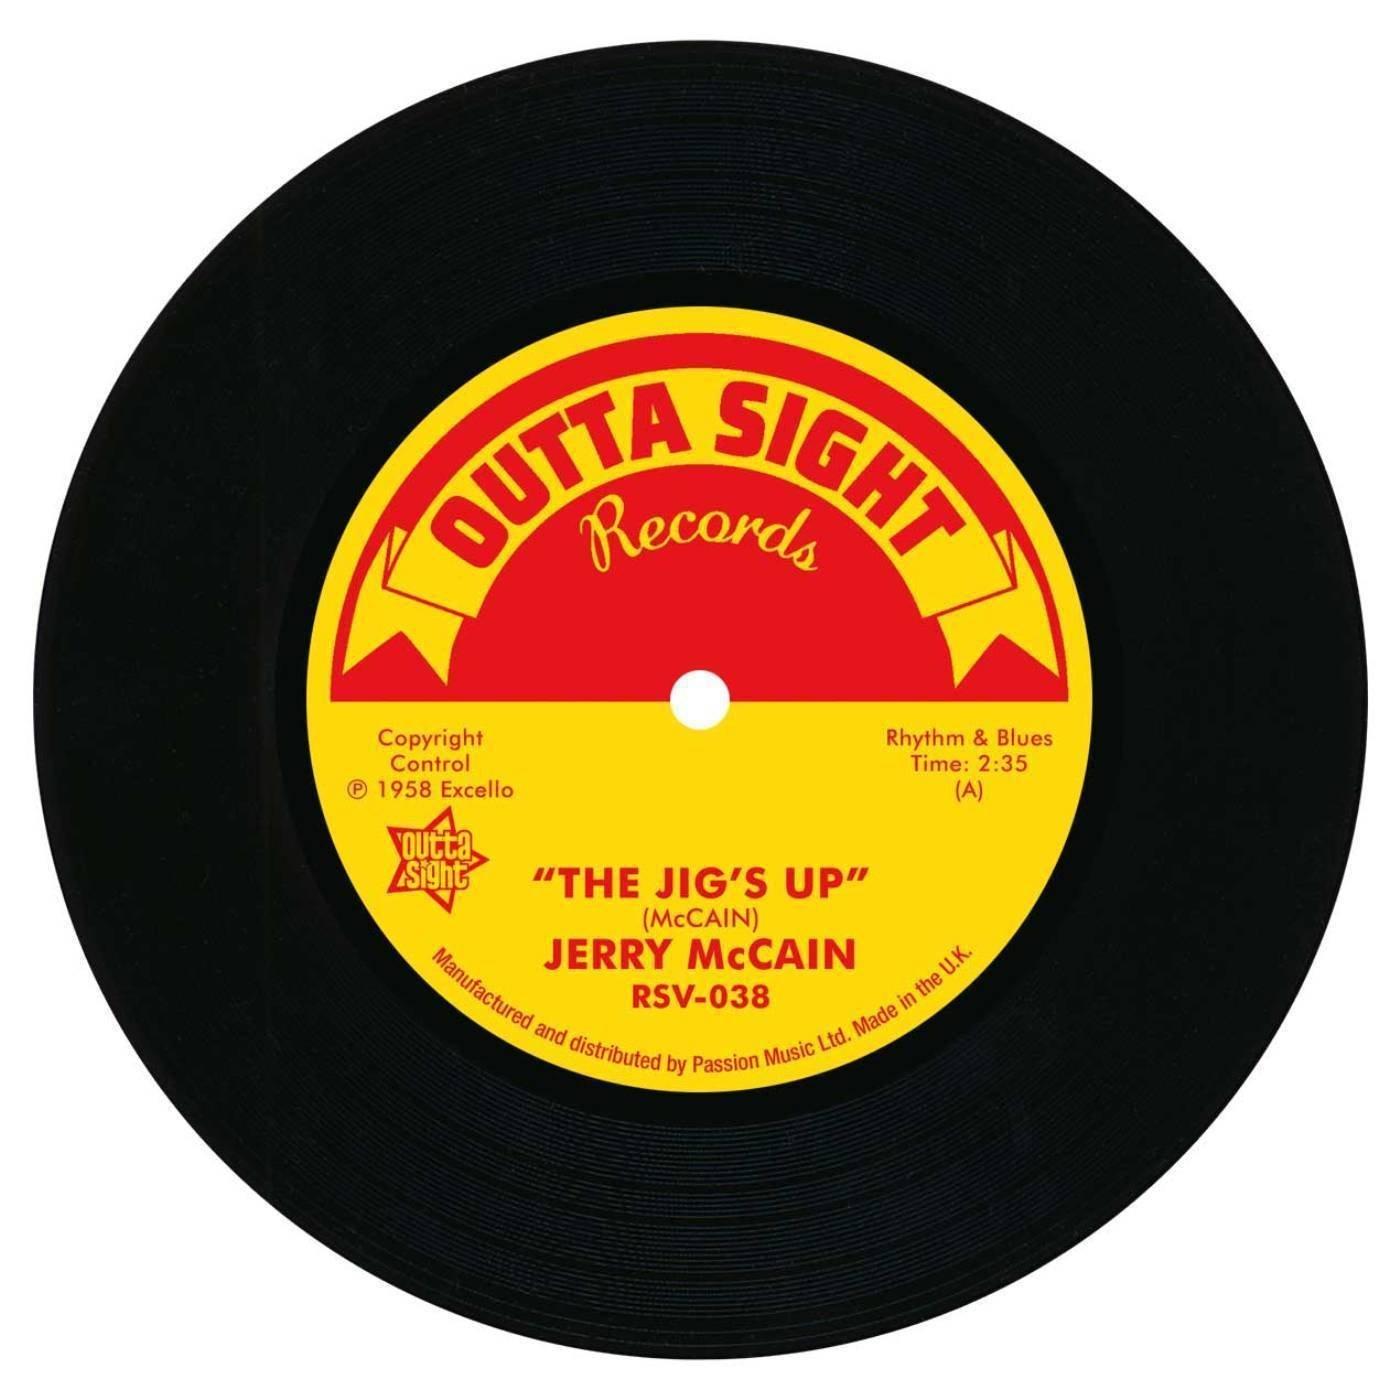 Jerry McCain – The Jig's Up / Twist 62 45 (Outta Sight) 7″ Vinyl